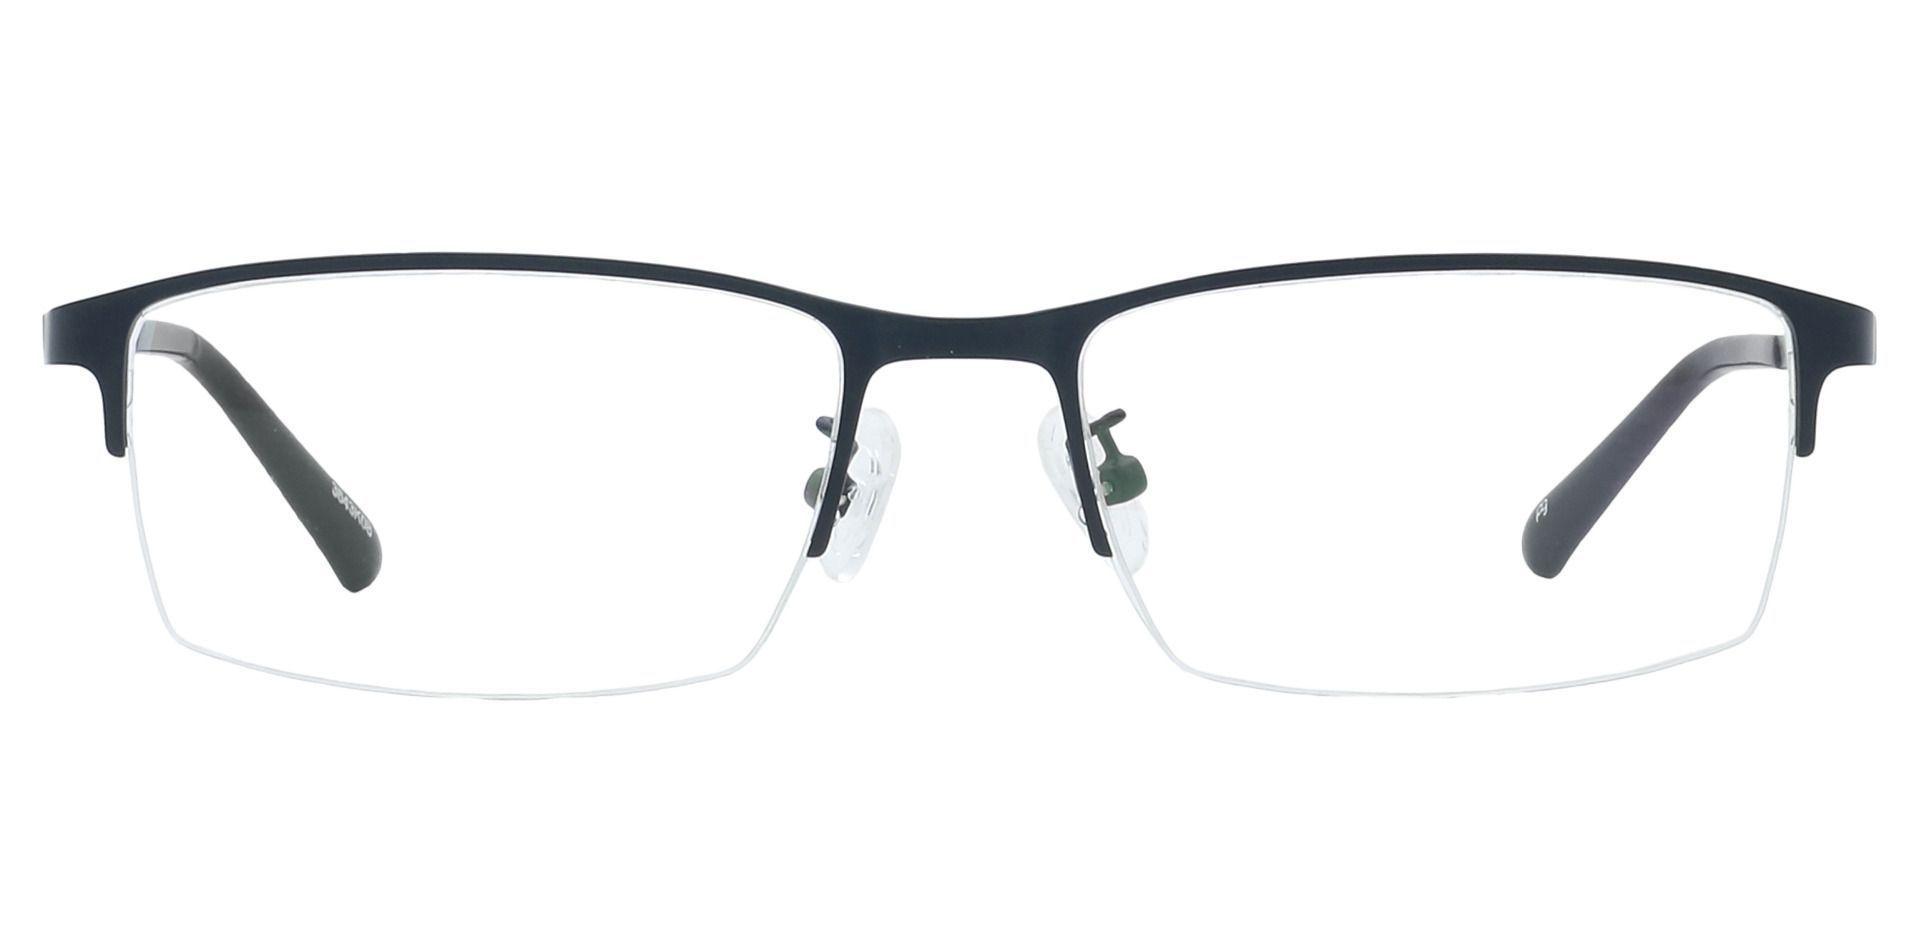 Percy Rectangle Reading Glasses - Black